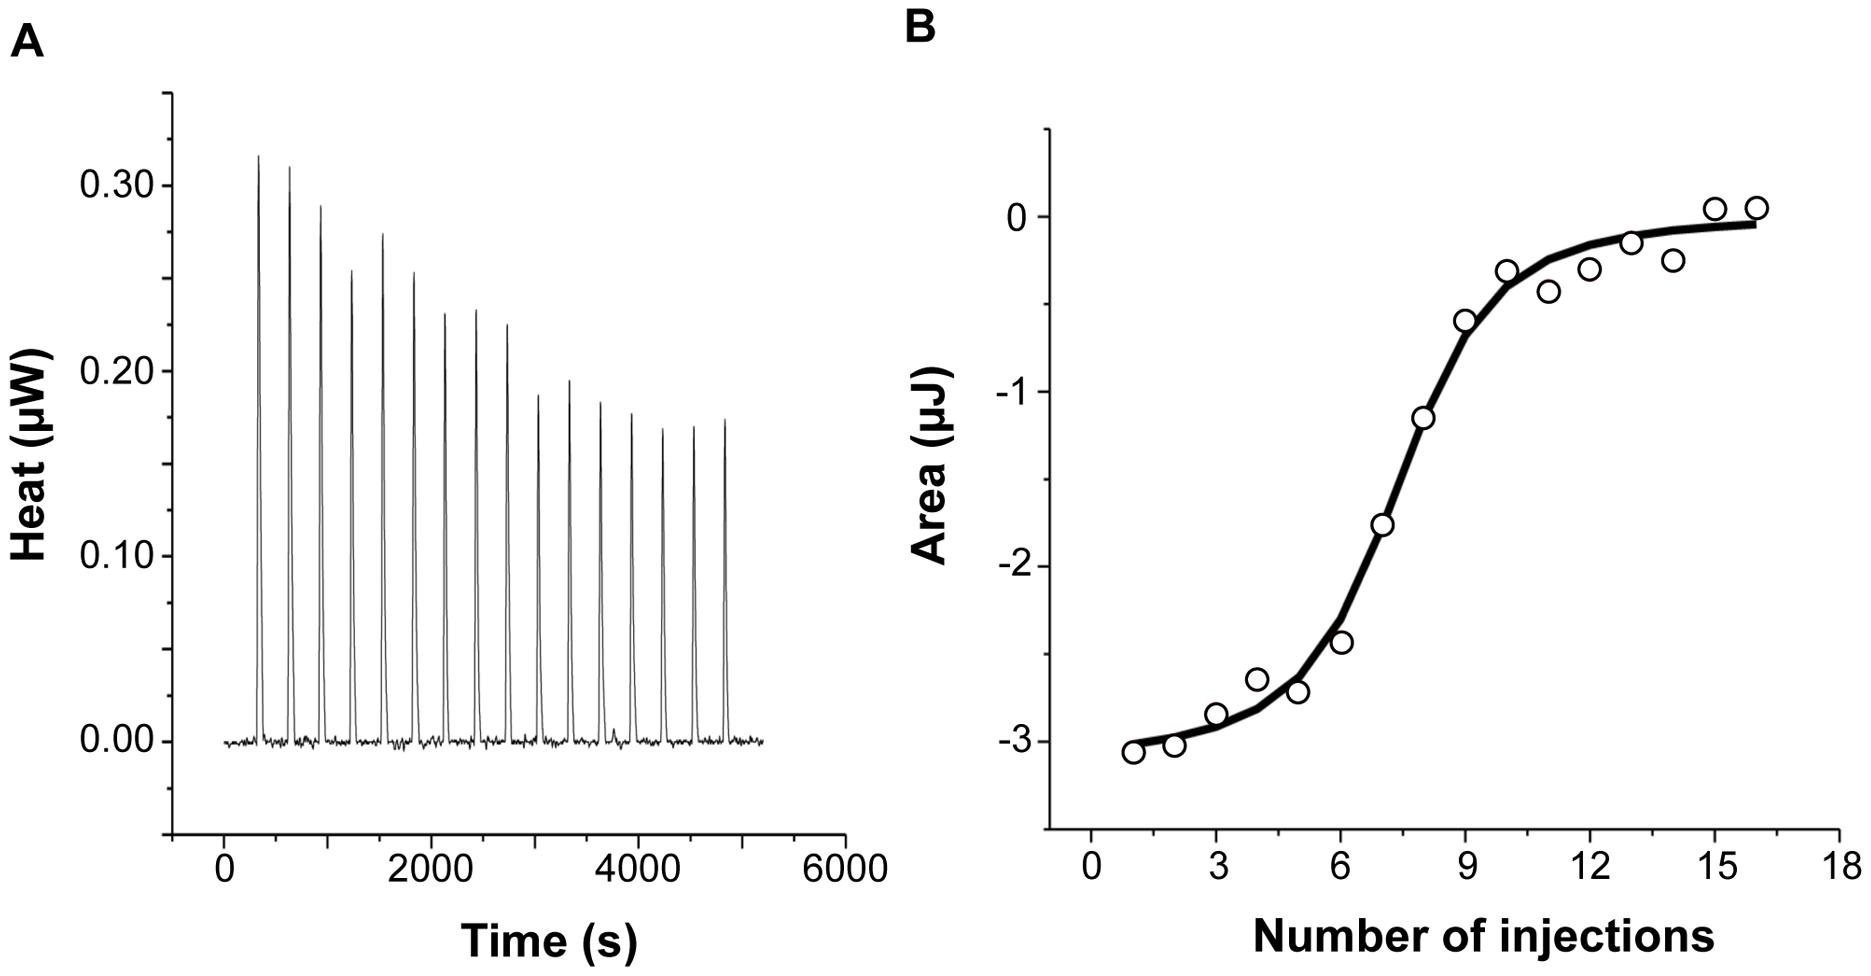 Calorimetric titration of recombinant human H-chain ferritin with IlsA.